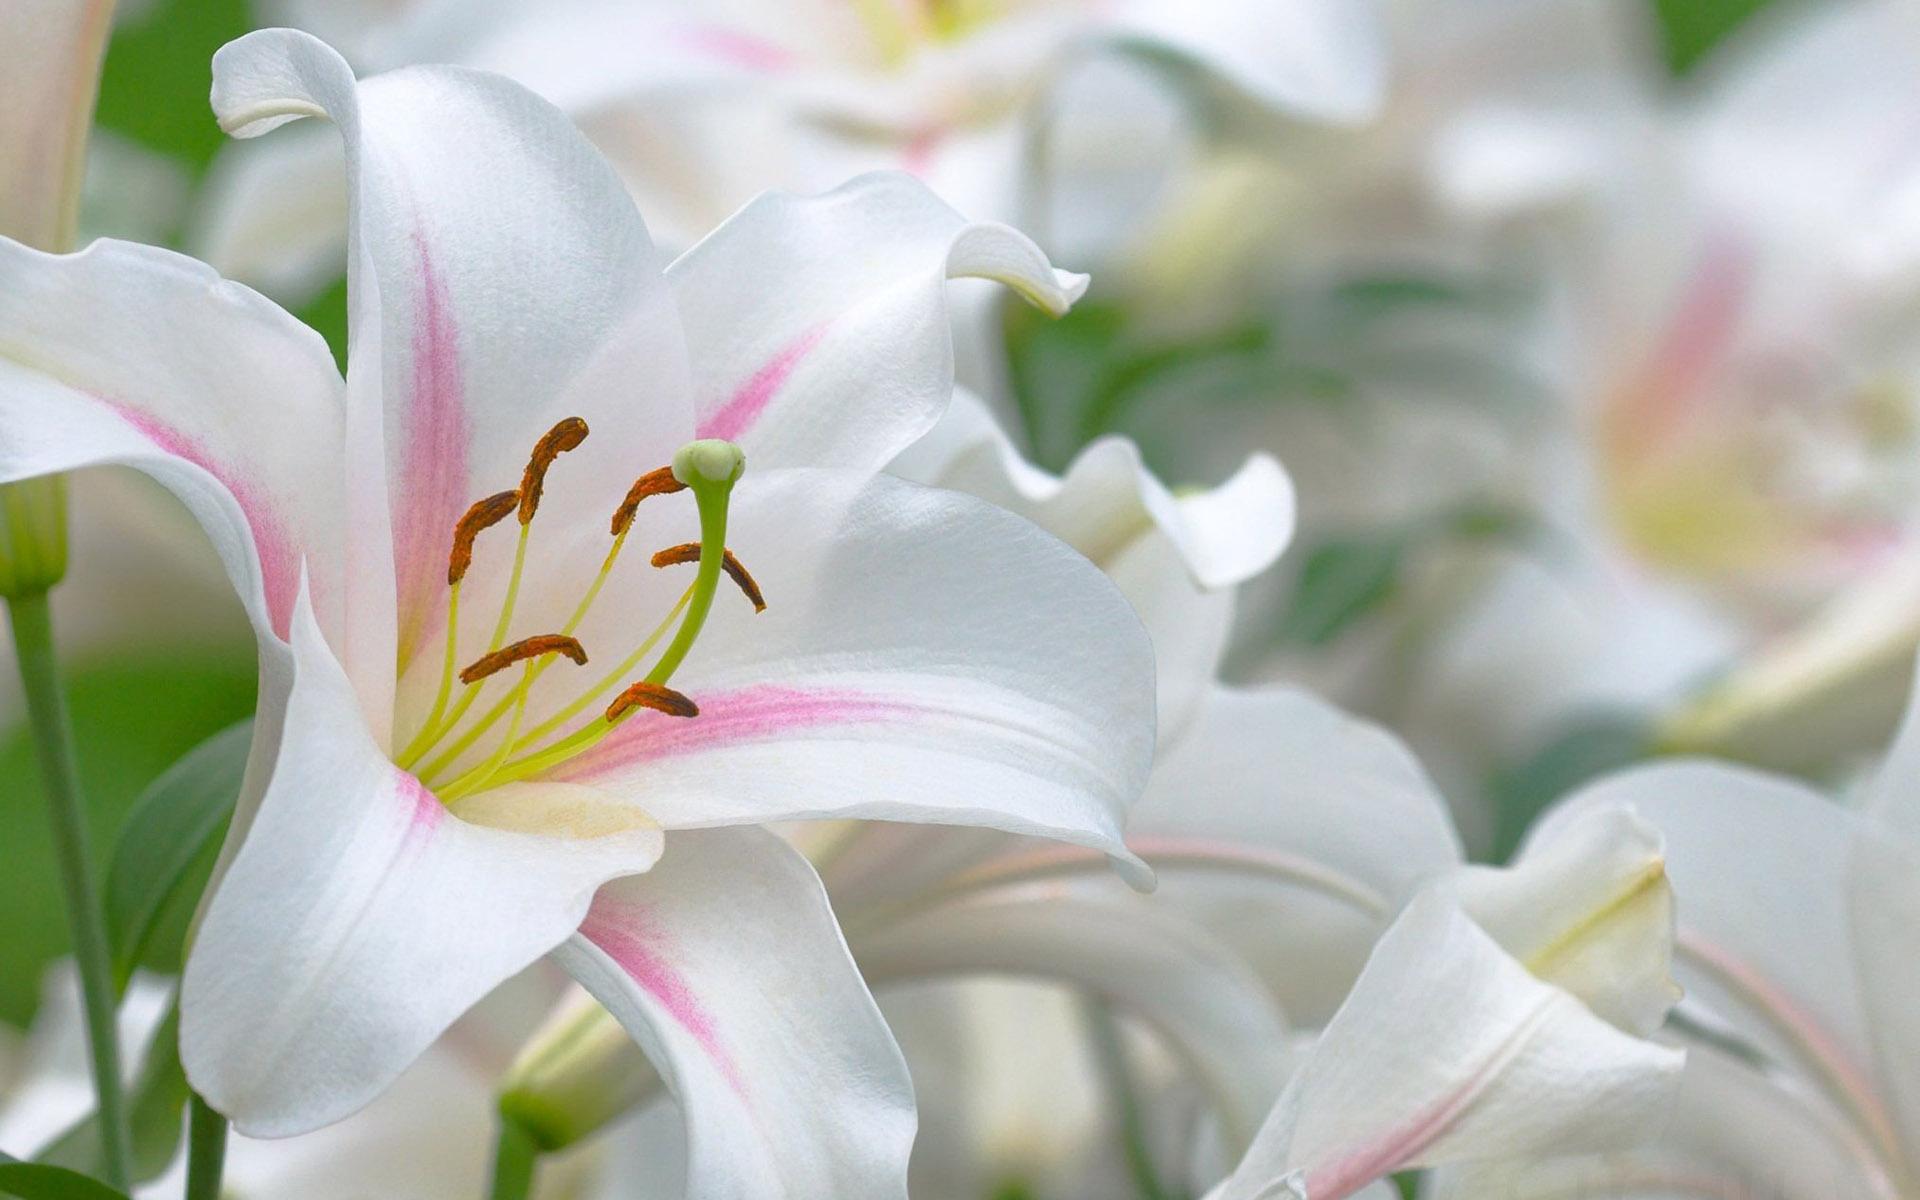 https://avante.biz/wp-content/uploads/Lily-Flower-Images-Wallpapers/Lily-Flower-Images-Wallpapers-046.jpg